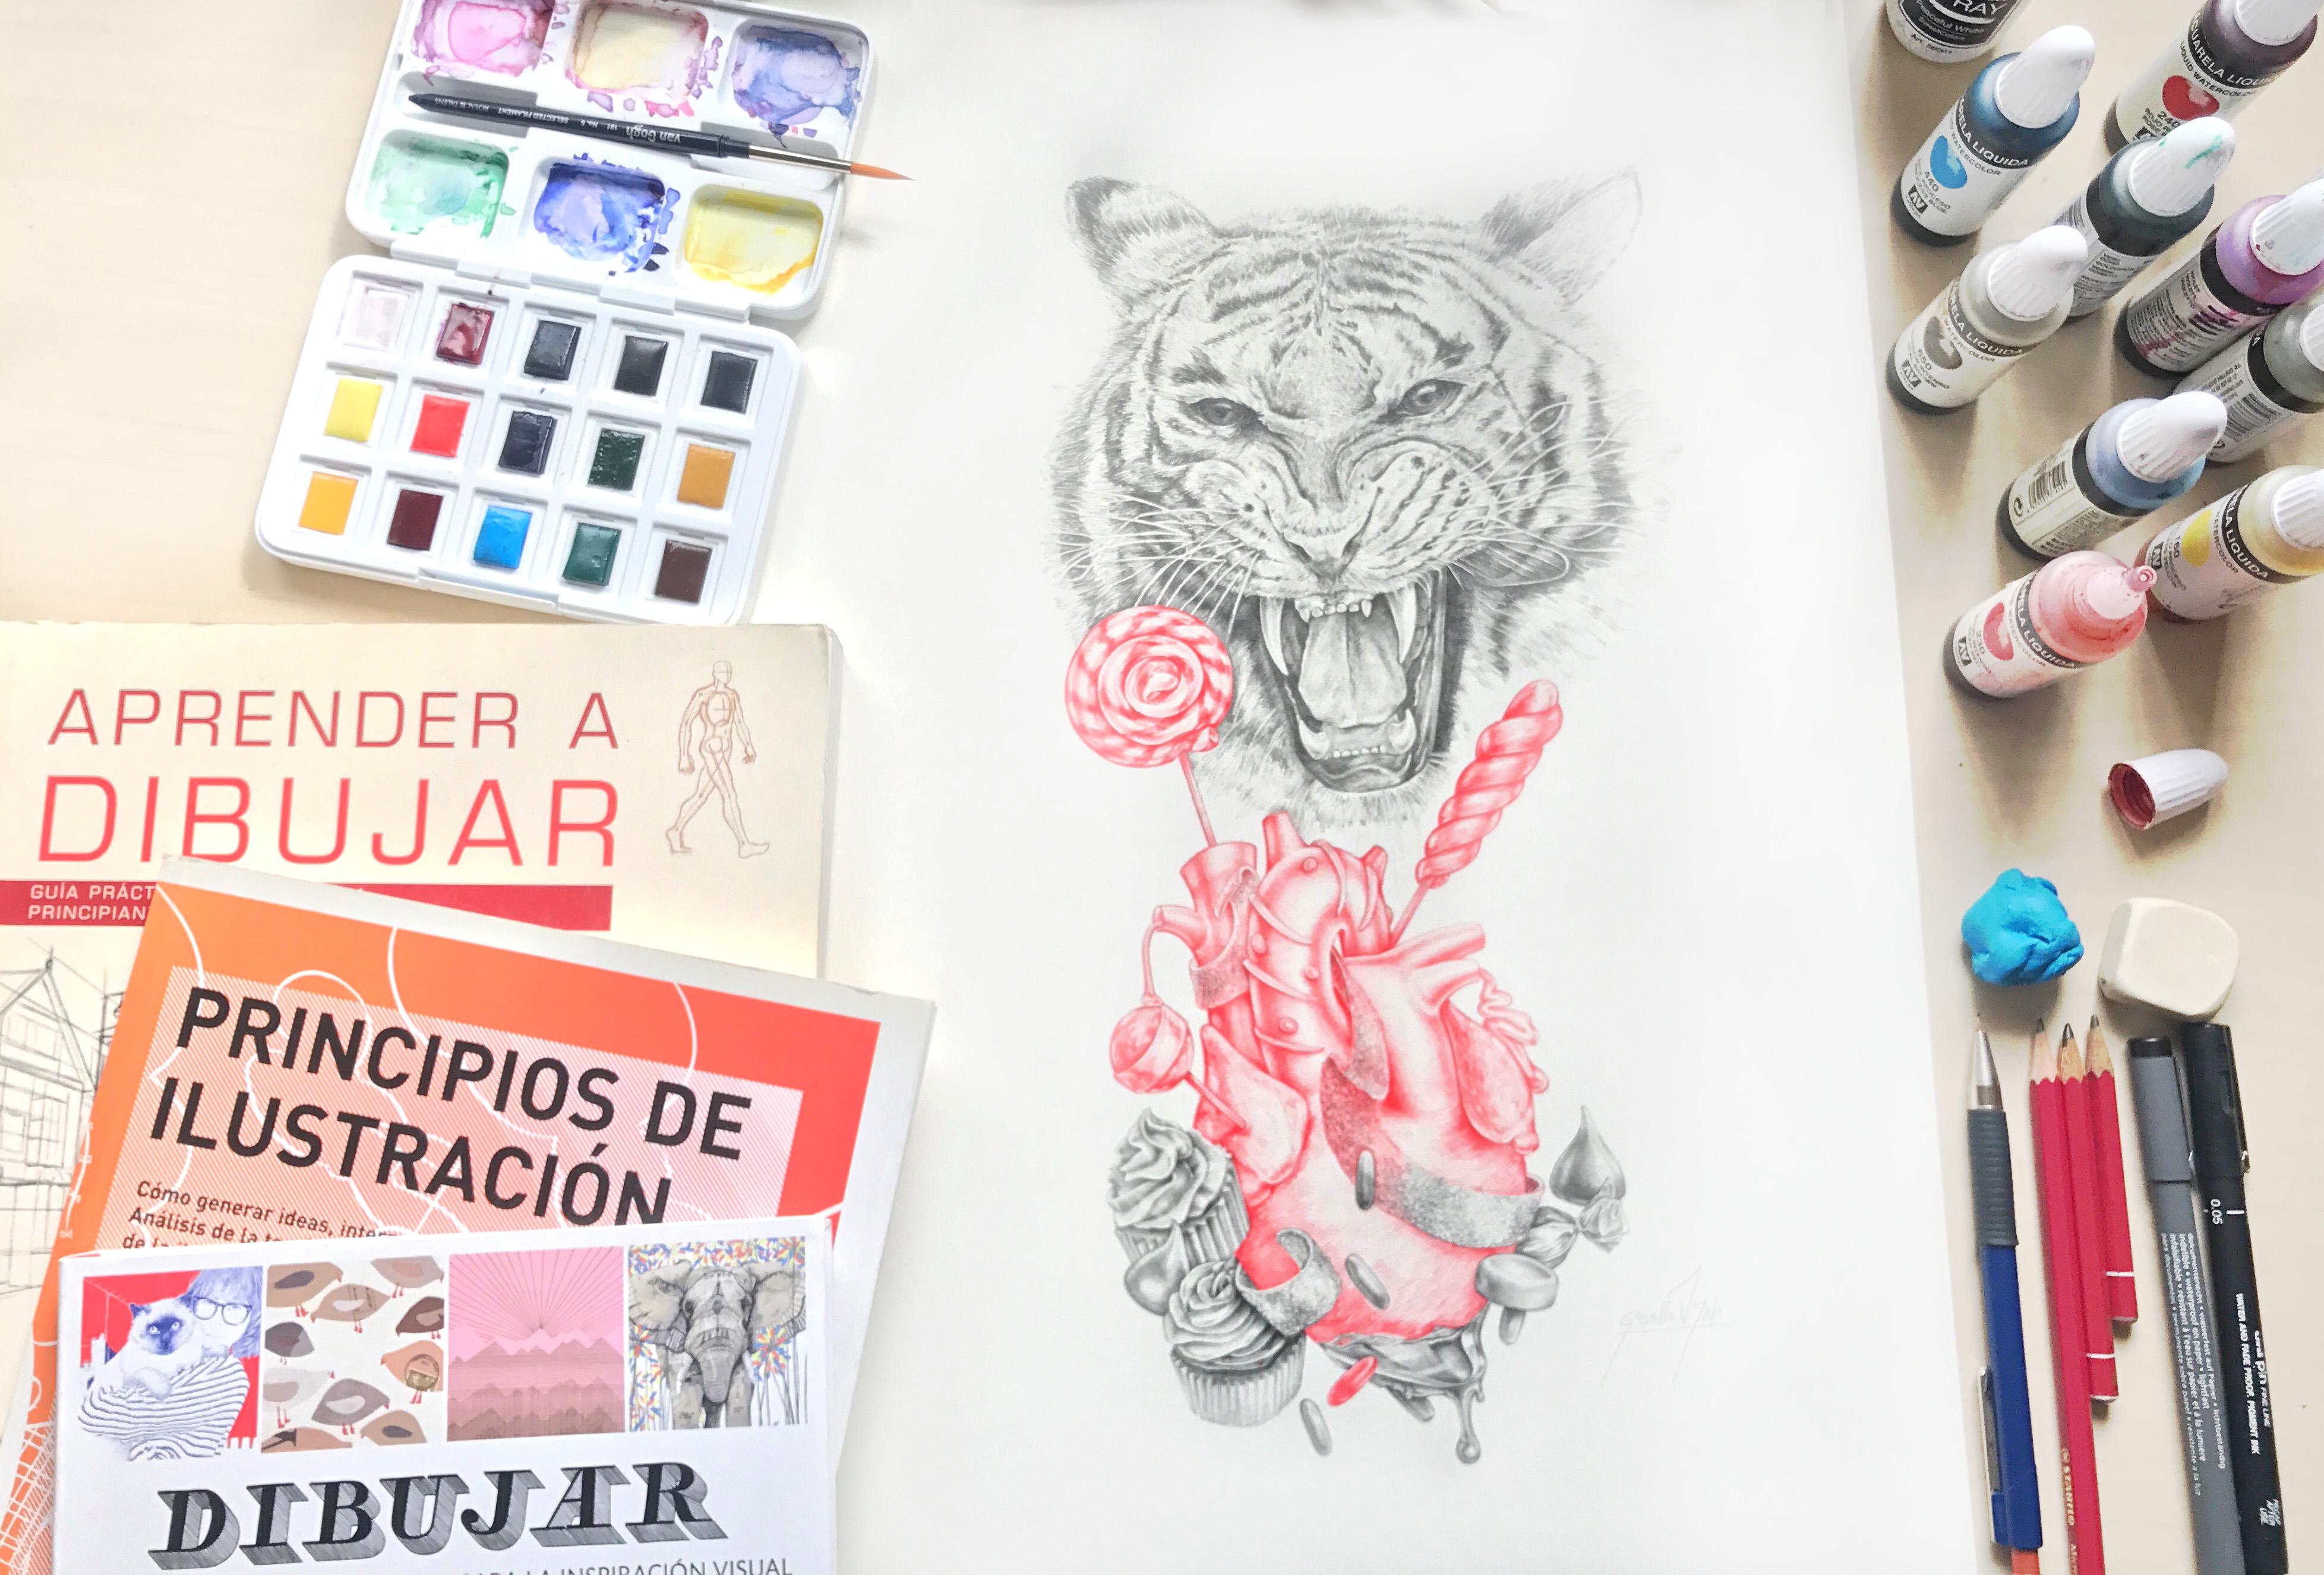 taller DE ILUSTRACIÓN EN BARCELONA GISELLE VITALI